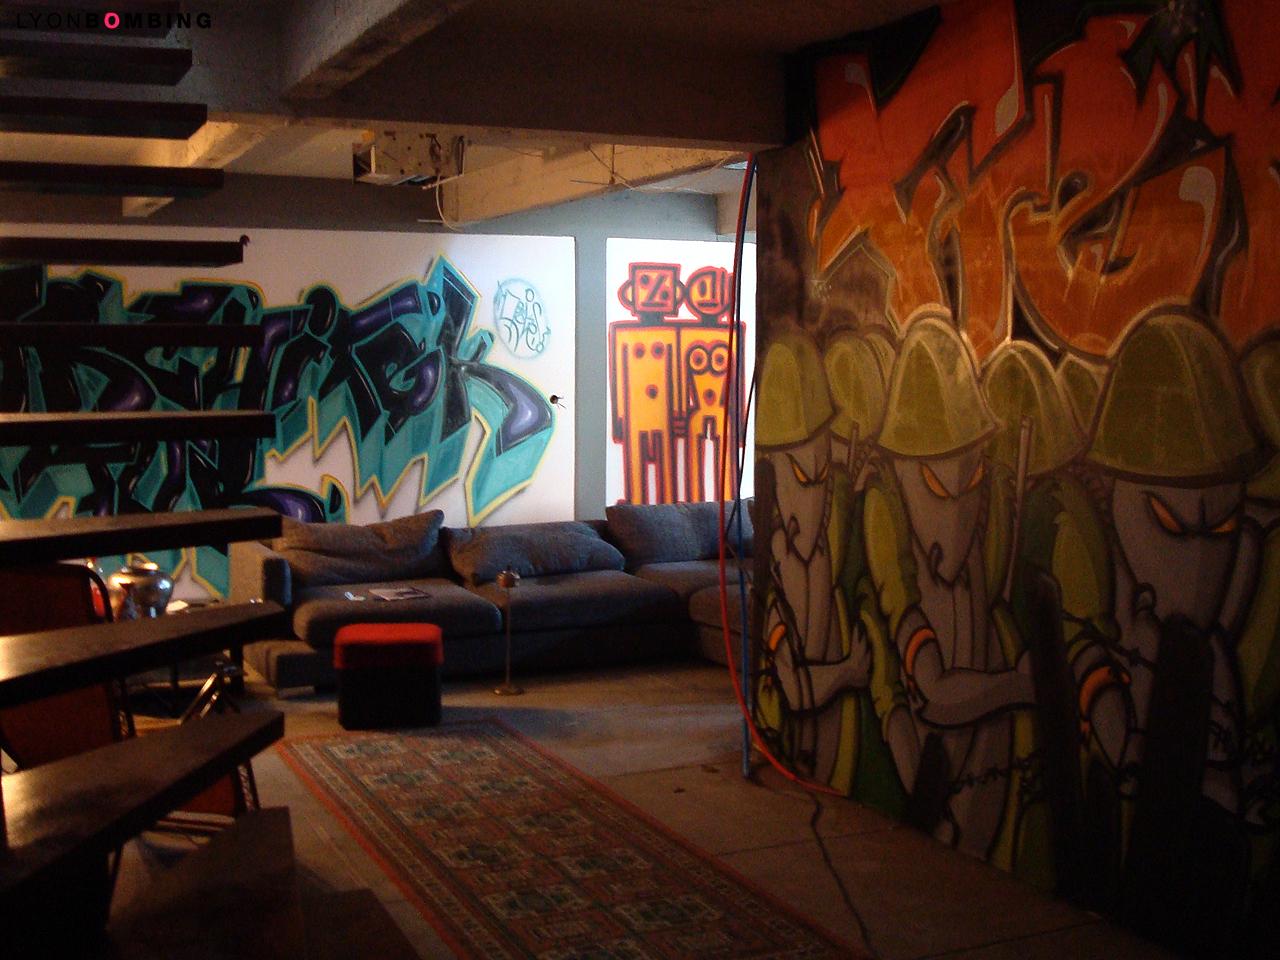 Ambiance graffiti dans un loft